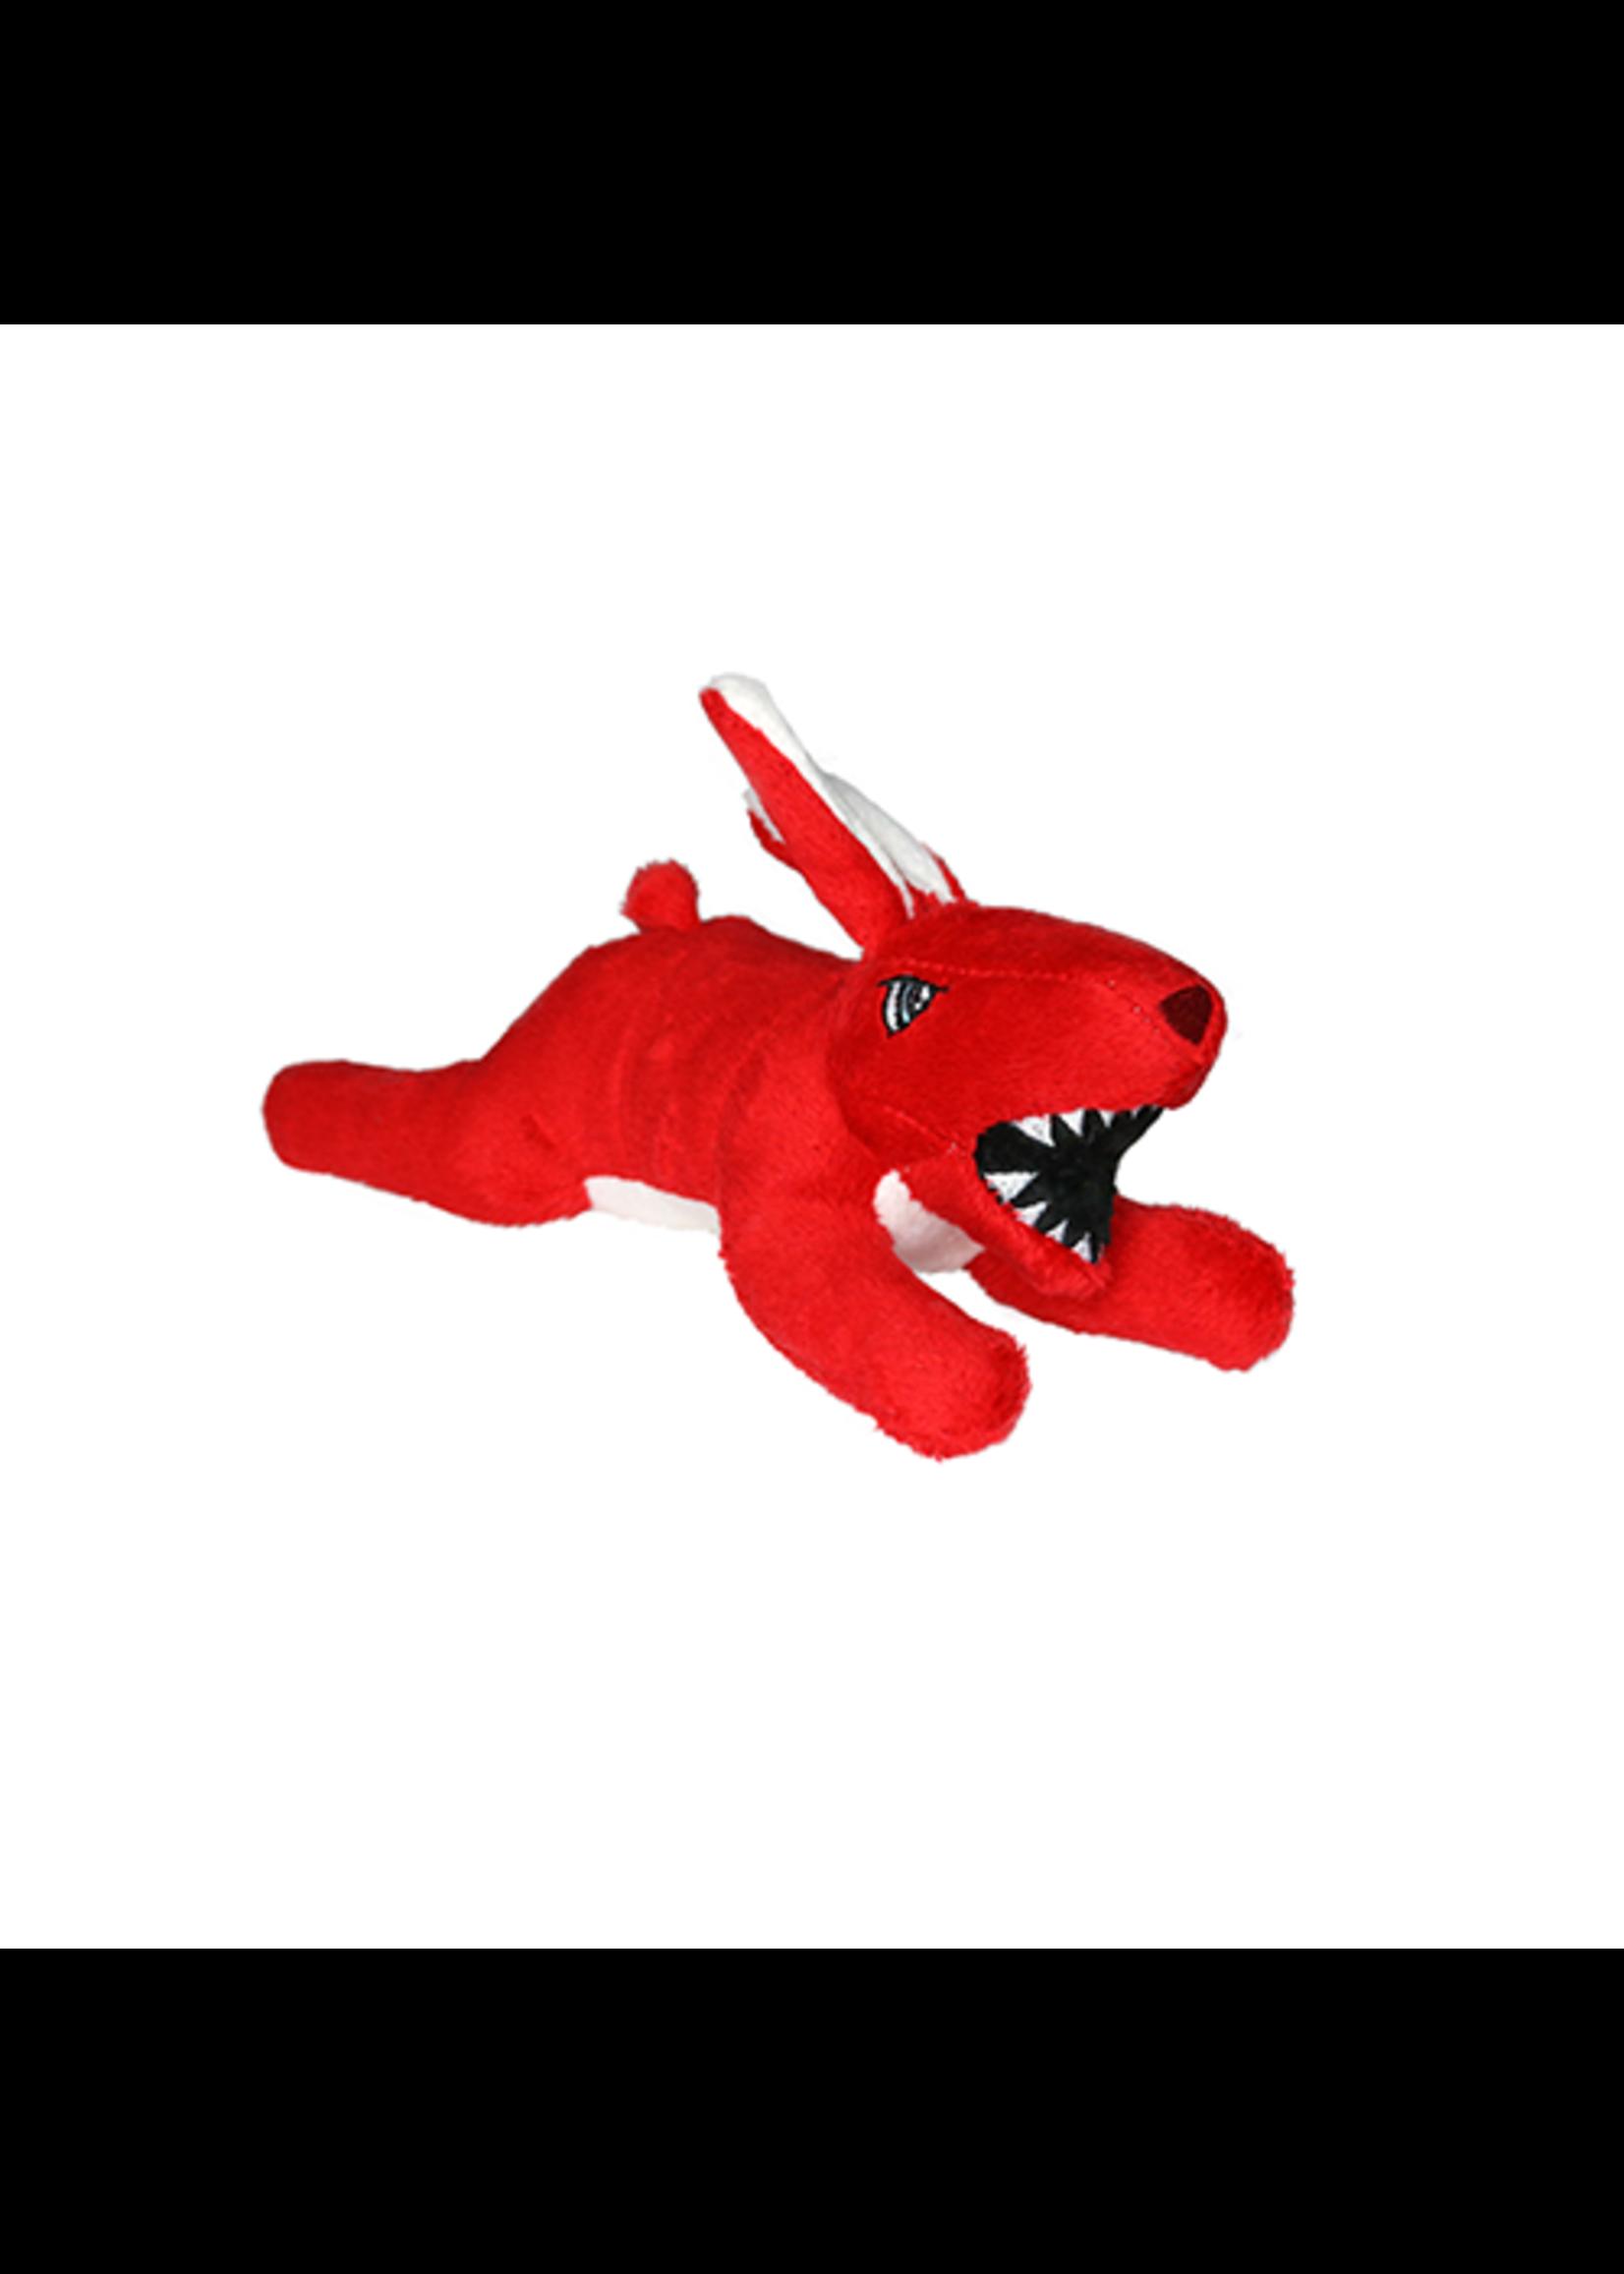 VIP Products/Tuffy VIP Mighty Angry Rabbit Jr